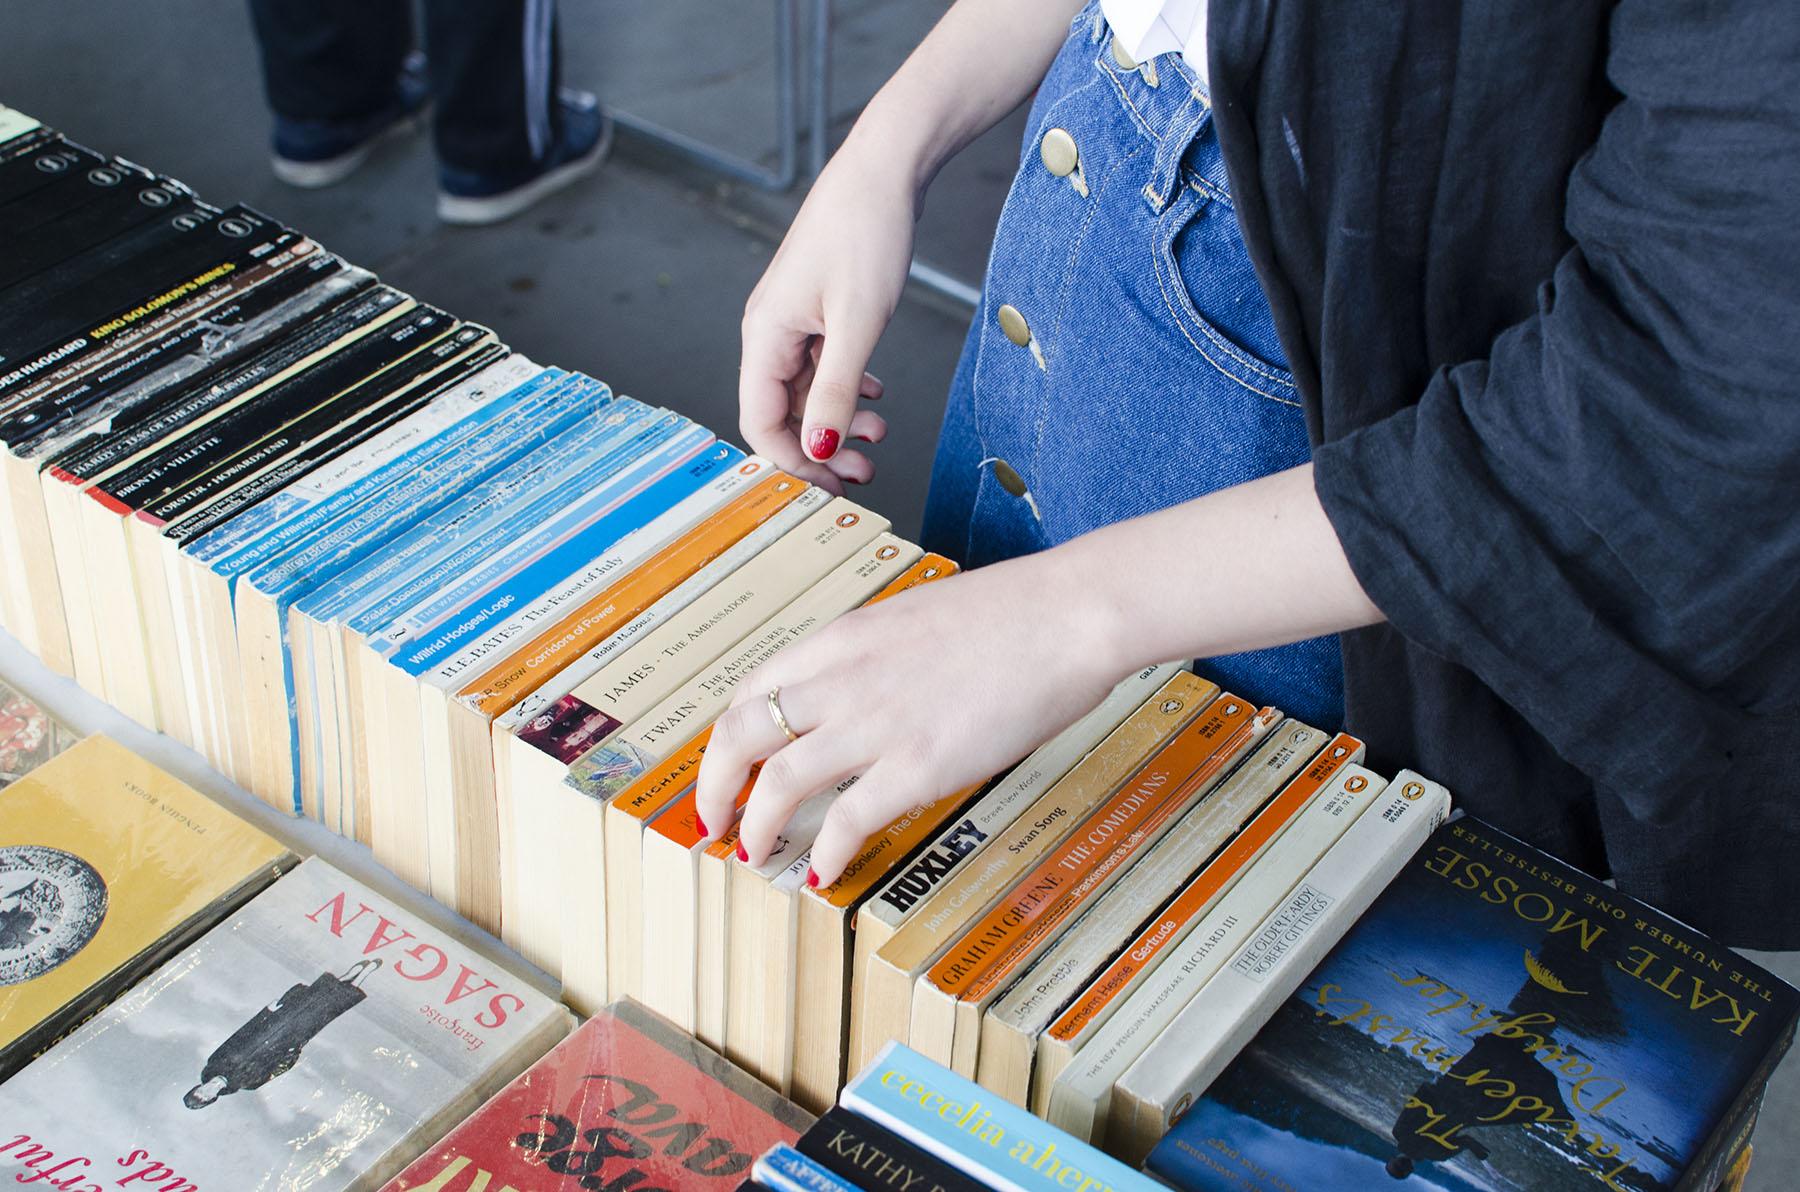 books_flea1.jpg